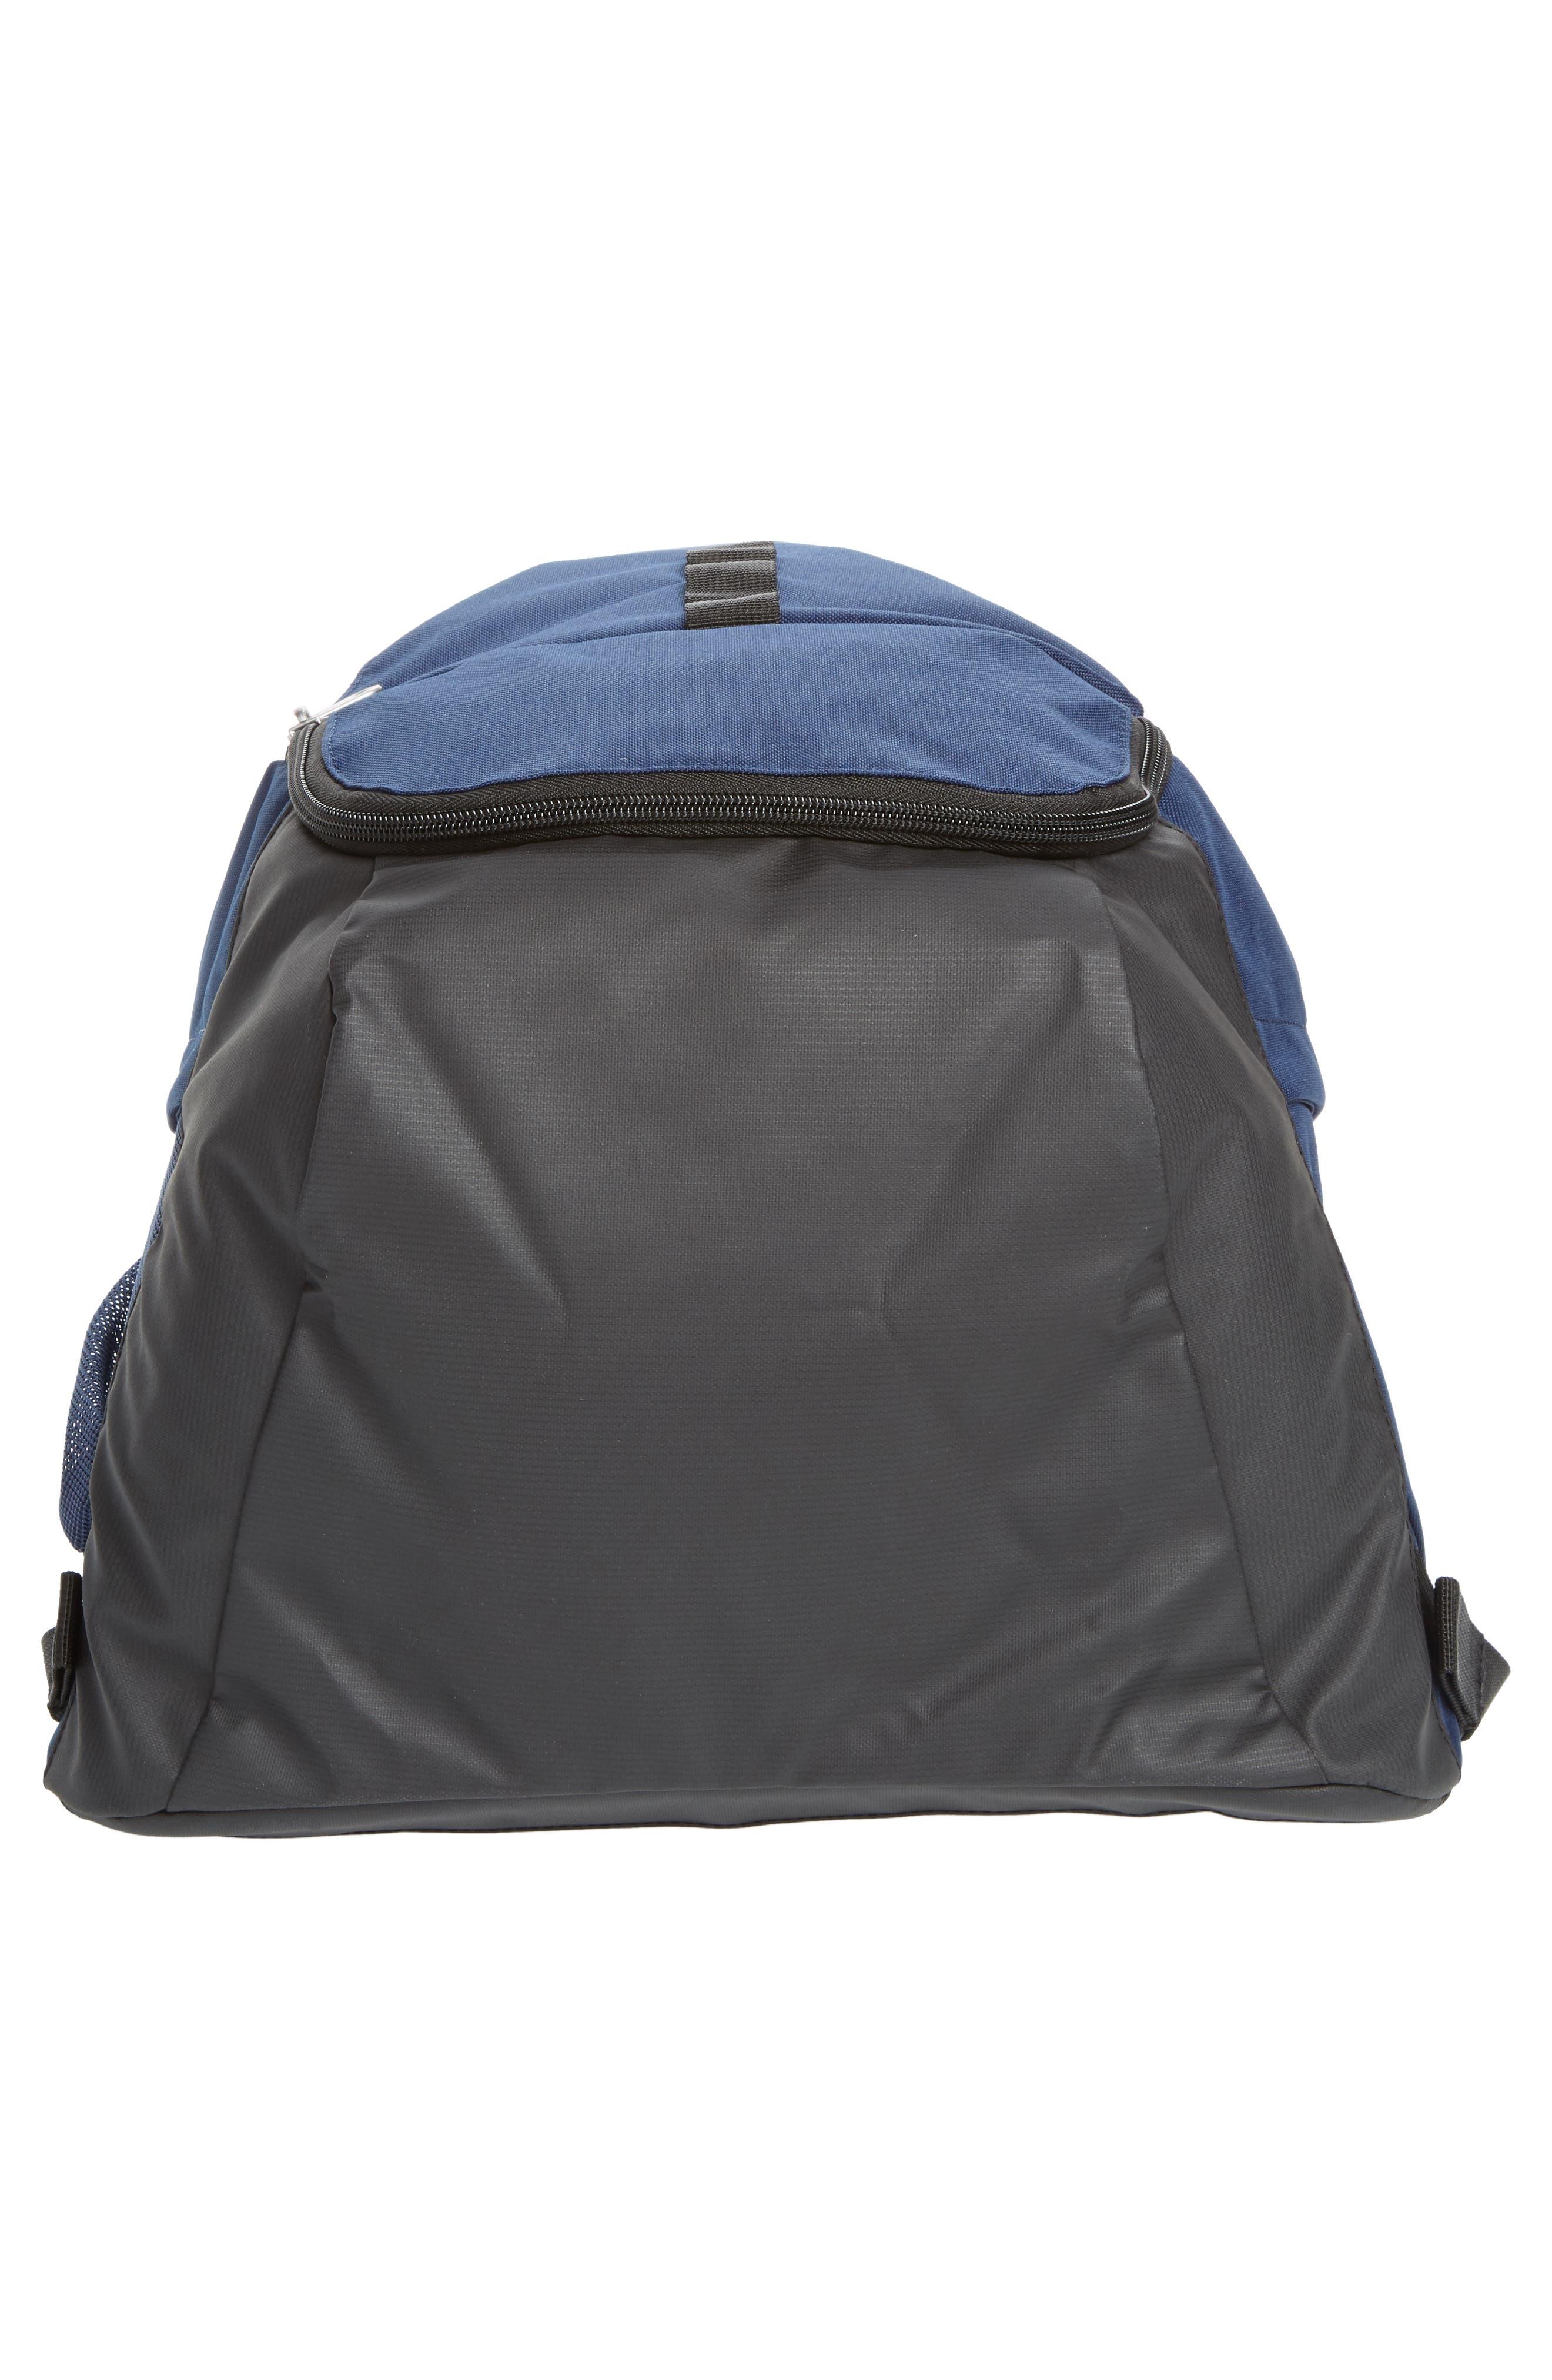 Club Team Backpack,                             Alternate thumbnail 5, color,                             Midnight Navy/ Black/ White